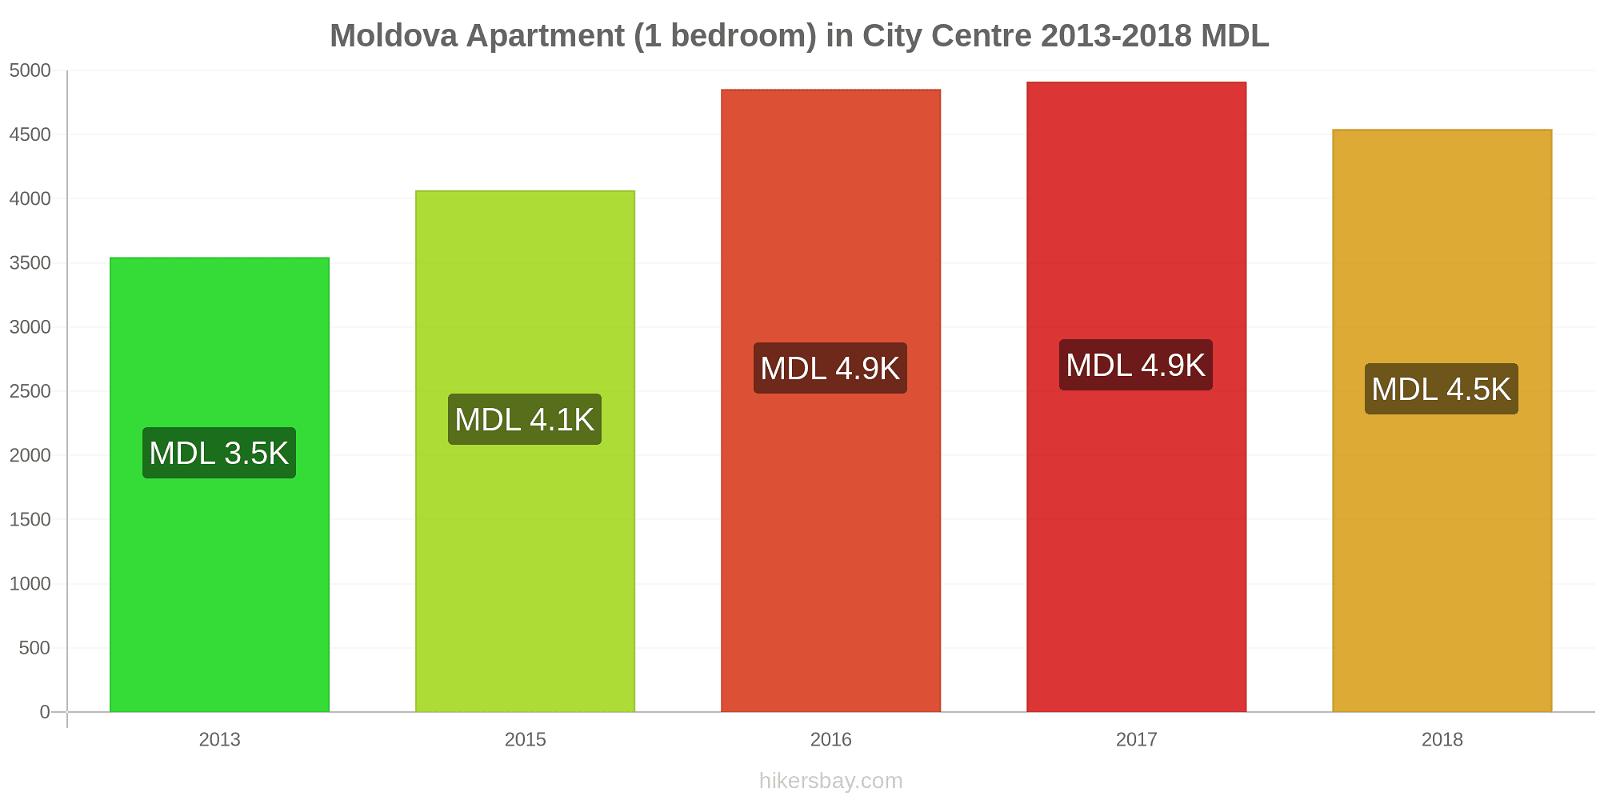 Moldova price changes Apartment (1 bedroom) in City Centre hikersbay.com